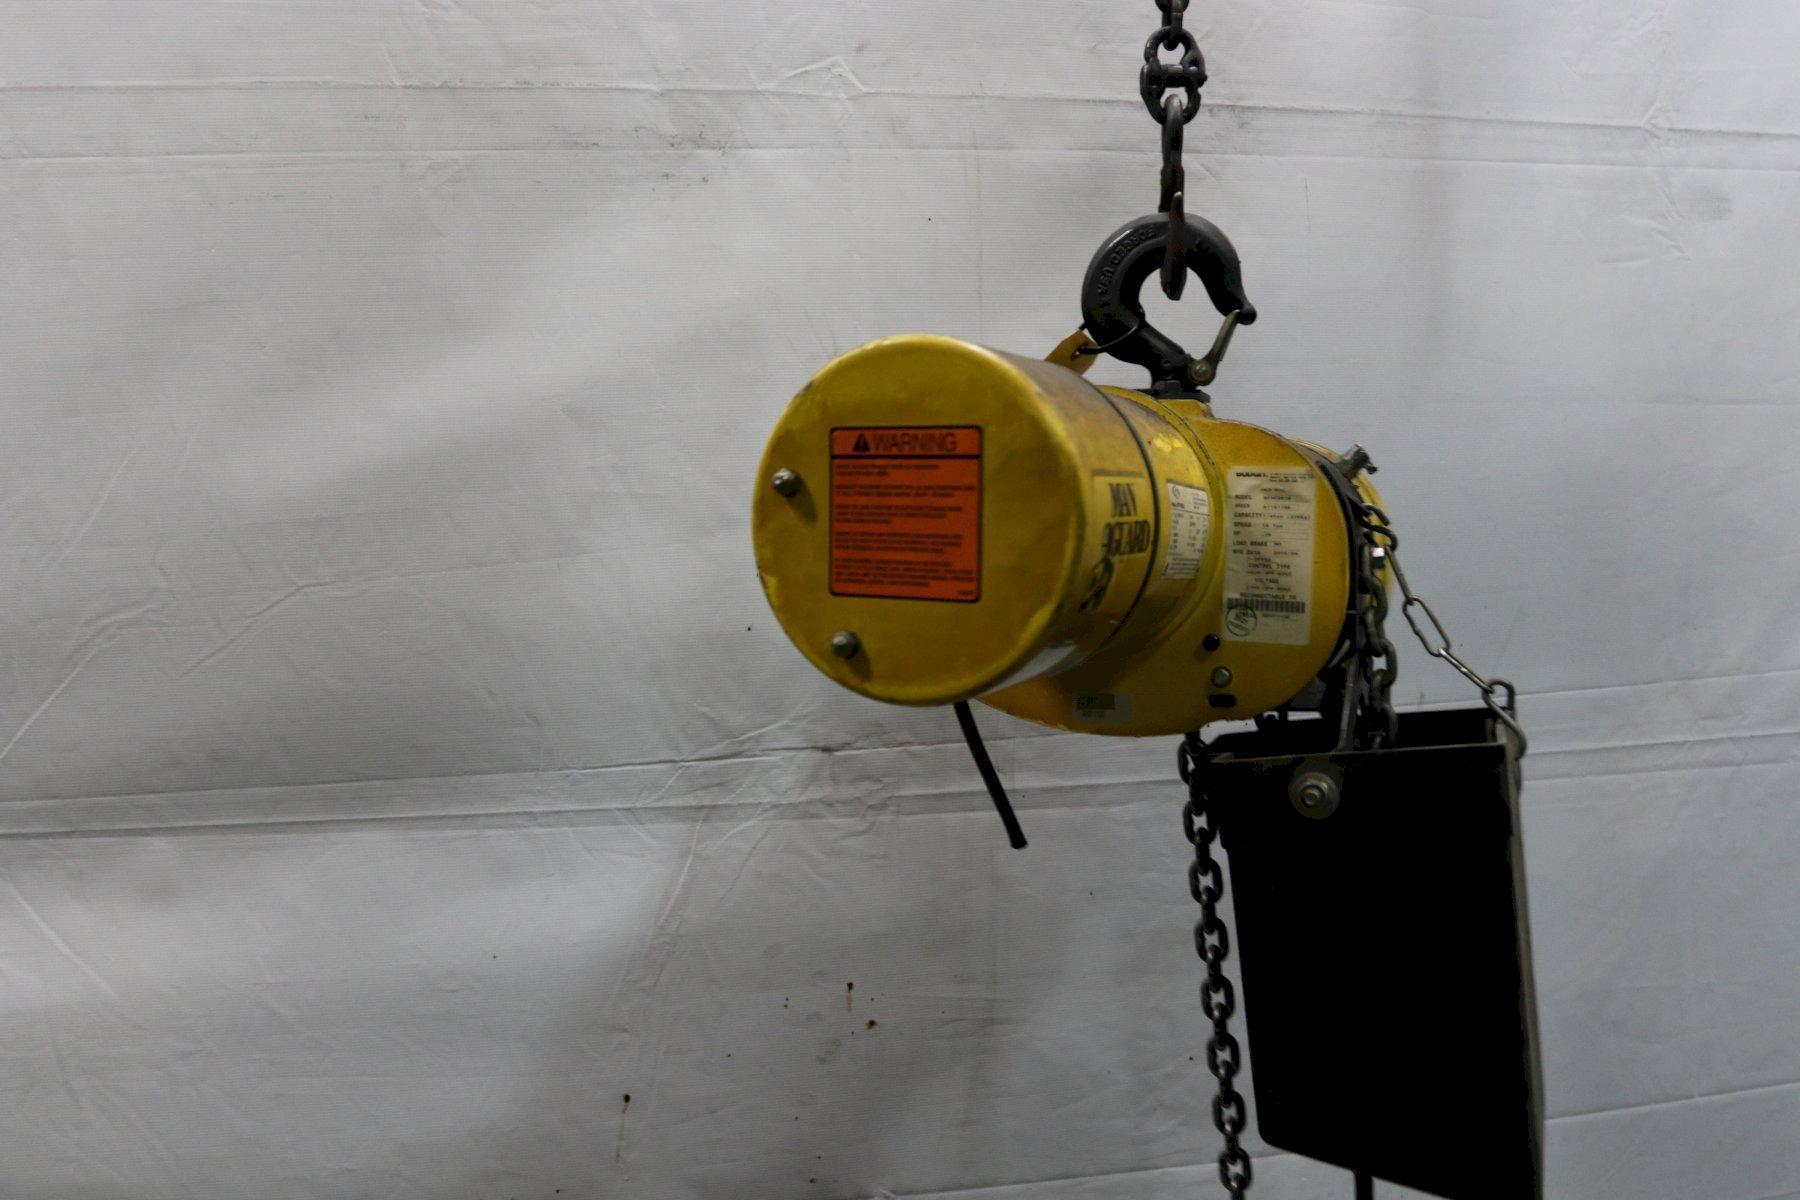 1/4 TON BUDGIT ELECTRIC POWERED CHAIN HOIST: STOCK #11987